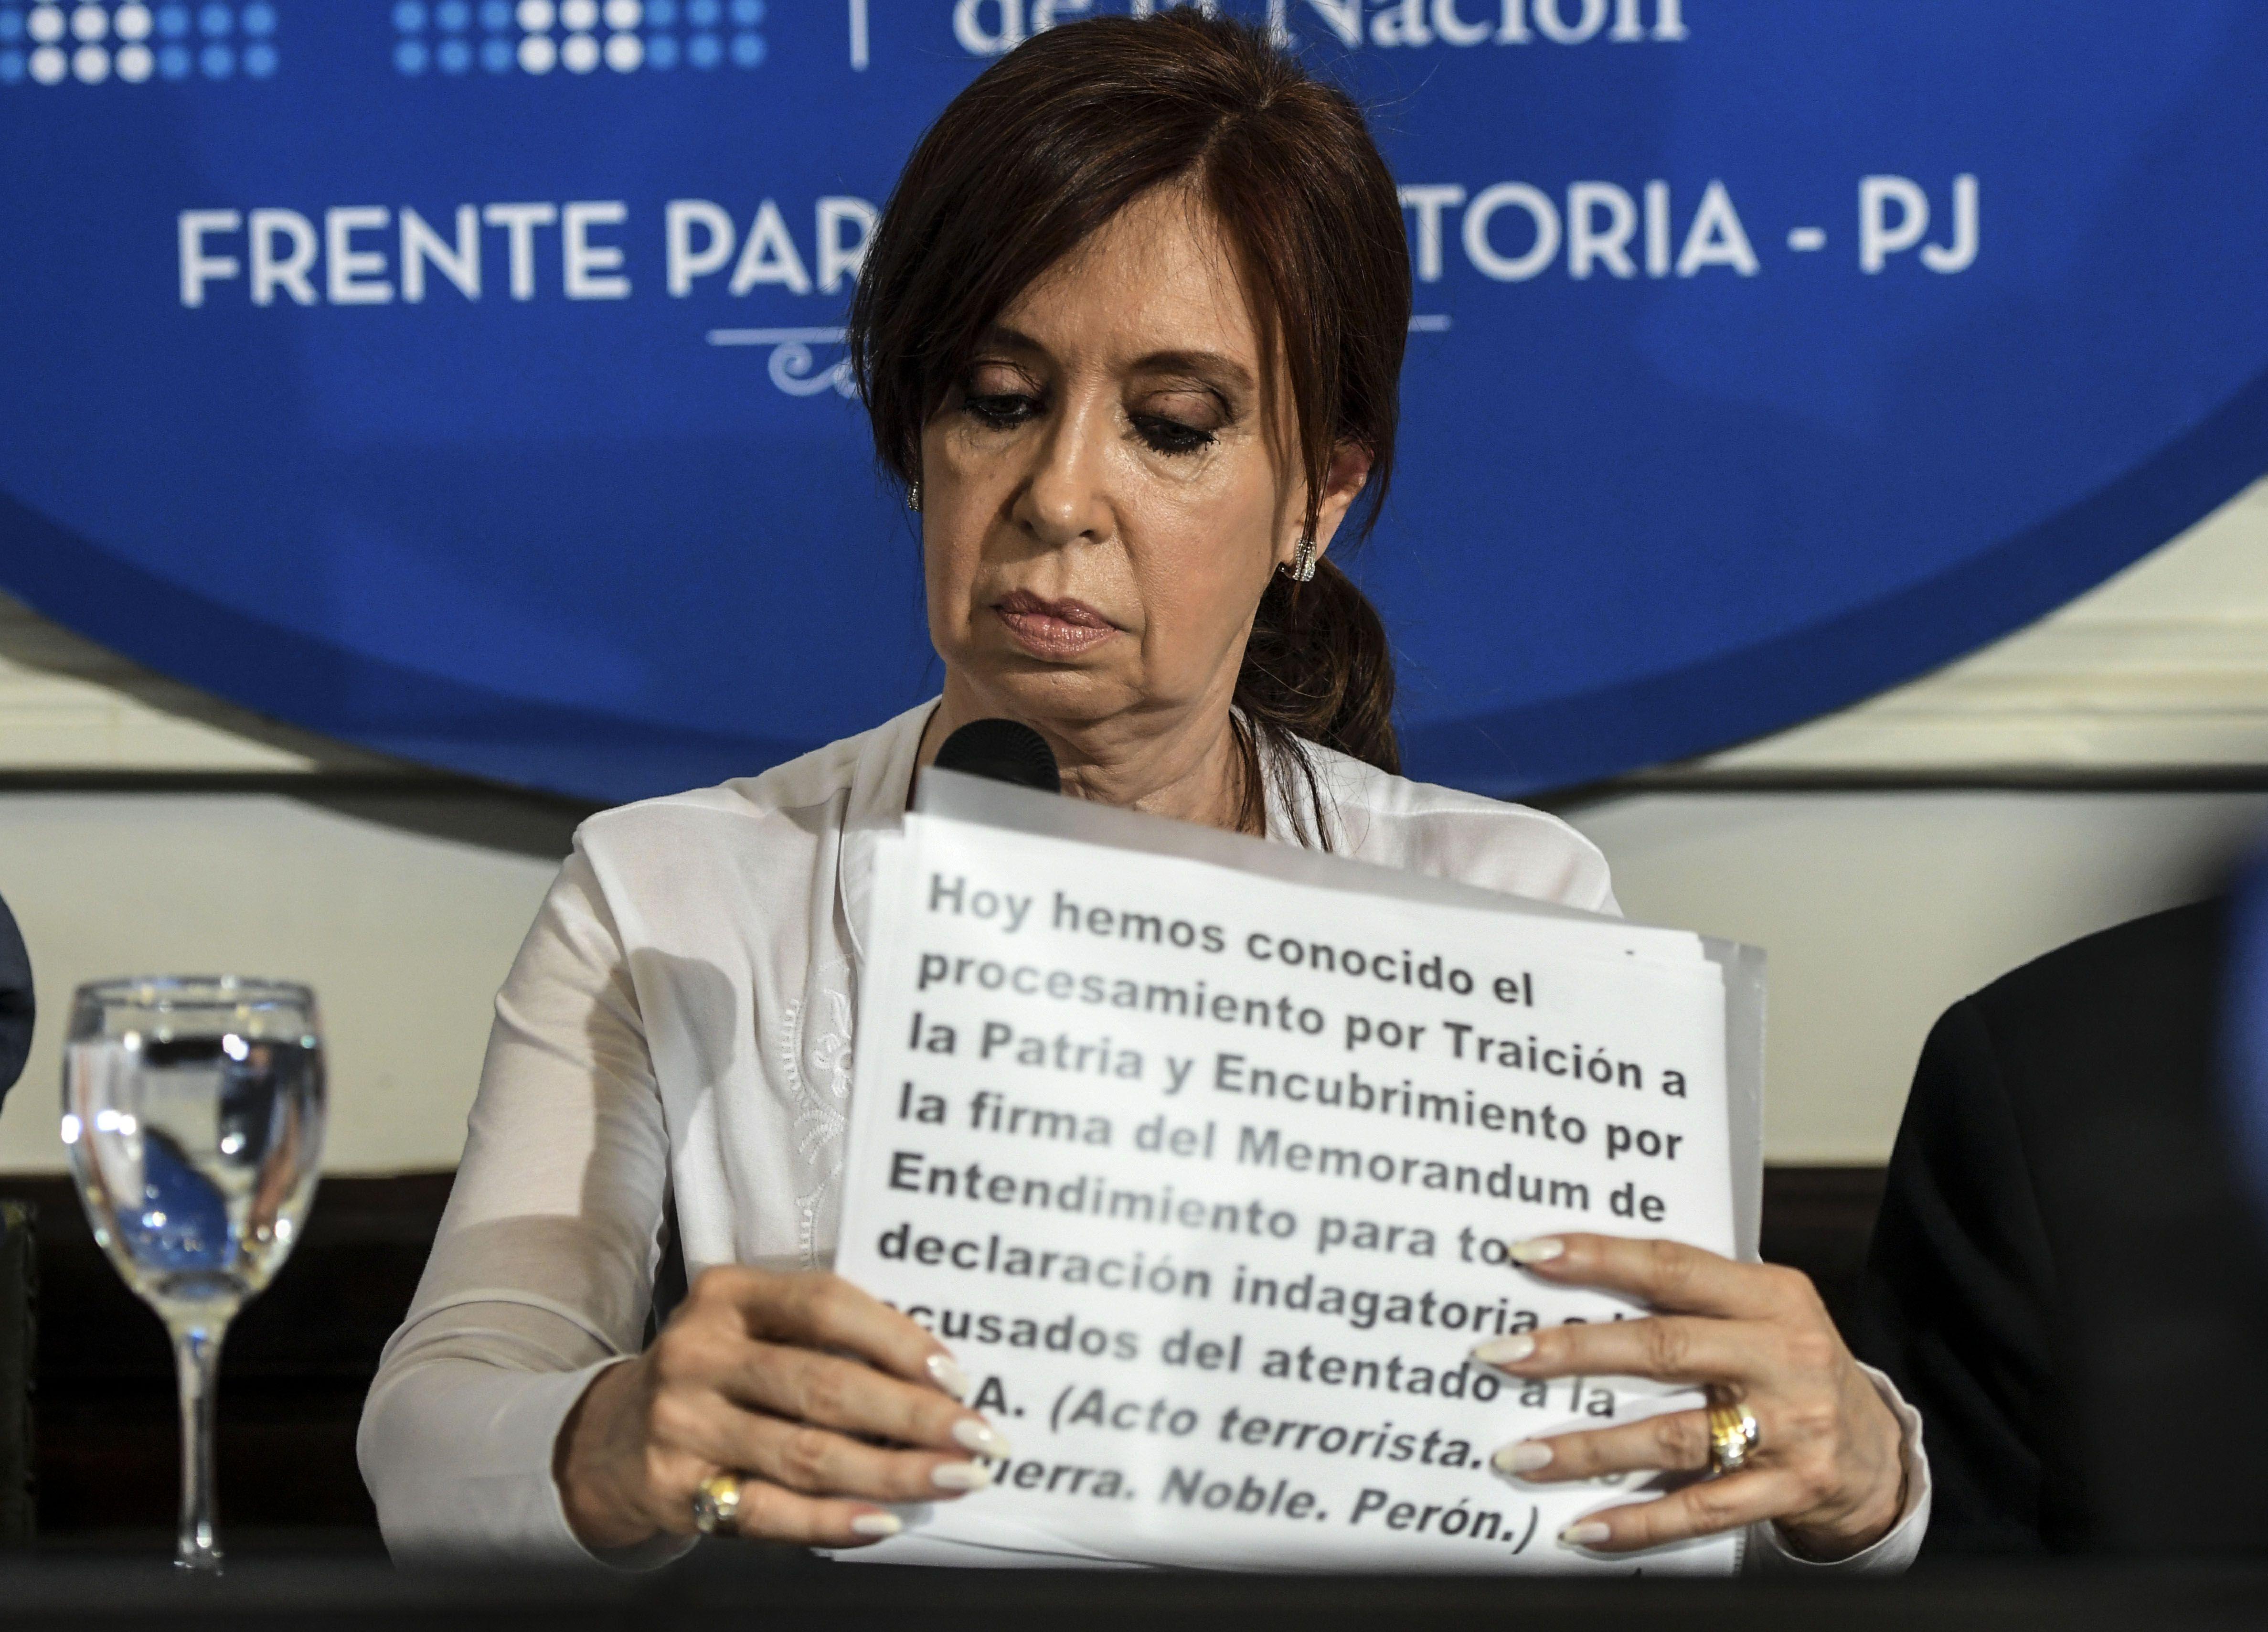 Conferencia de prensa de Cristina Kirchner.